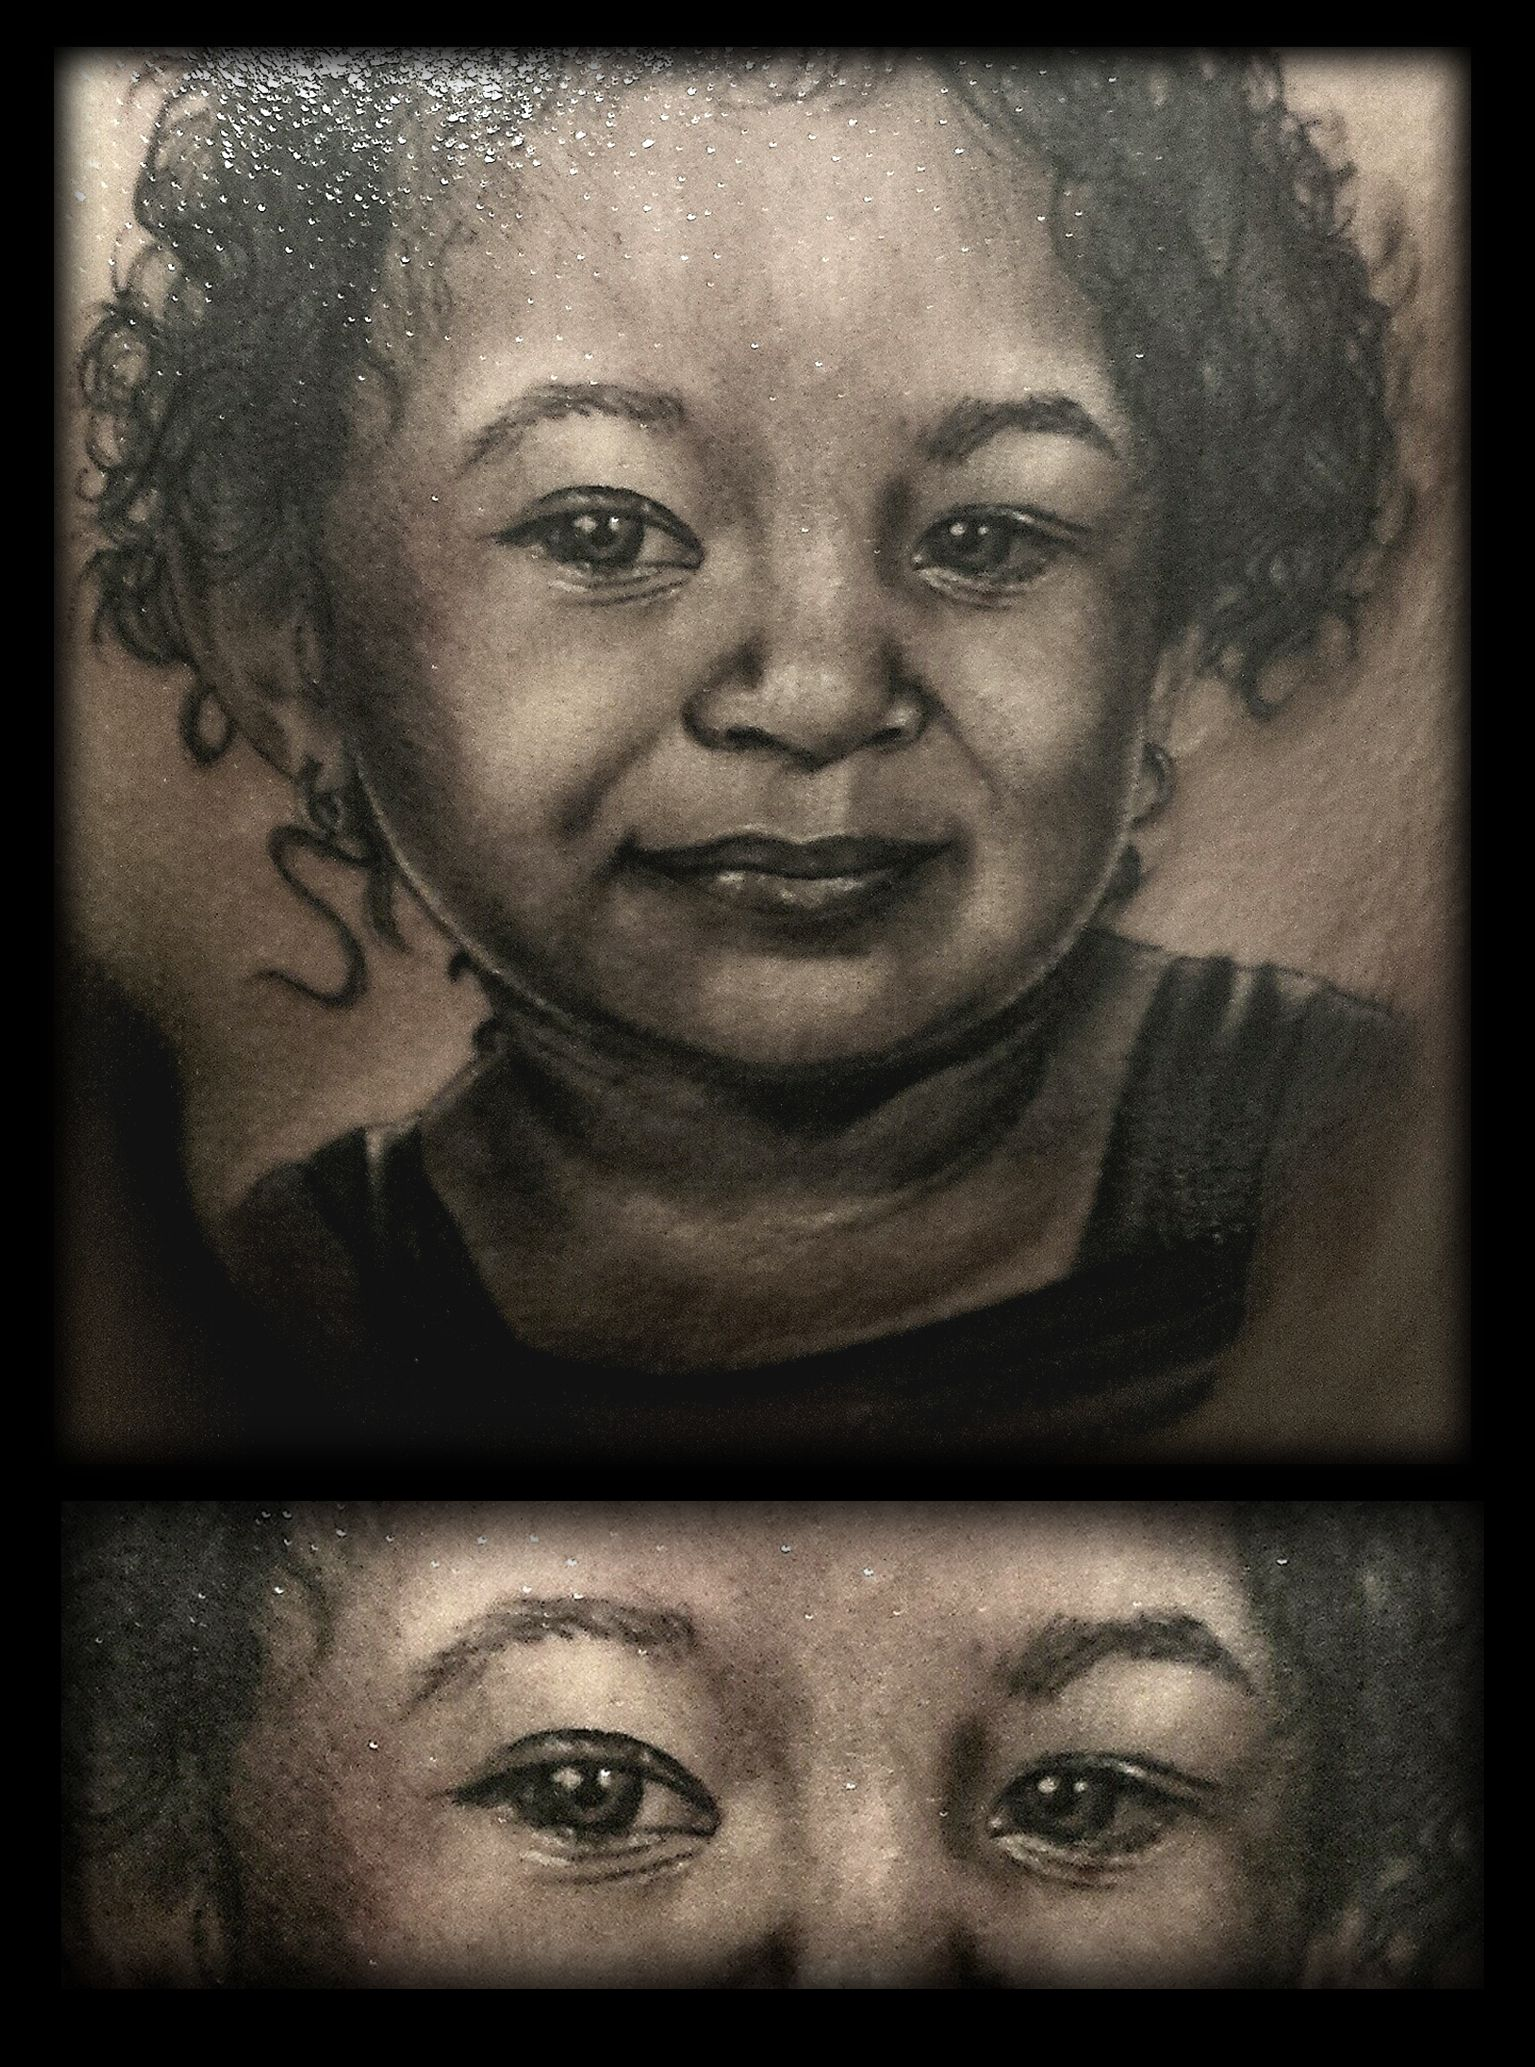 #tattoo #tatuaje #real #realismo #realistic #realista #retrato #portrait #kid #girl #child